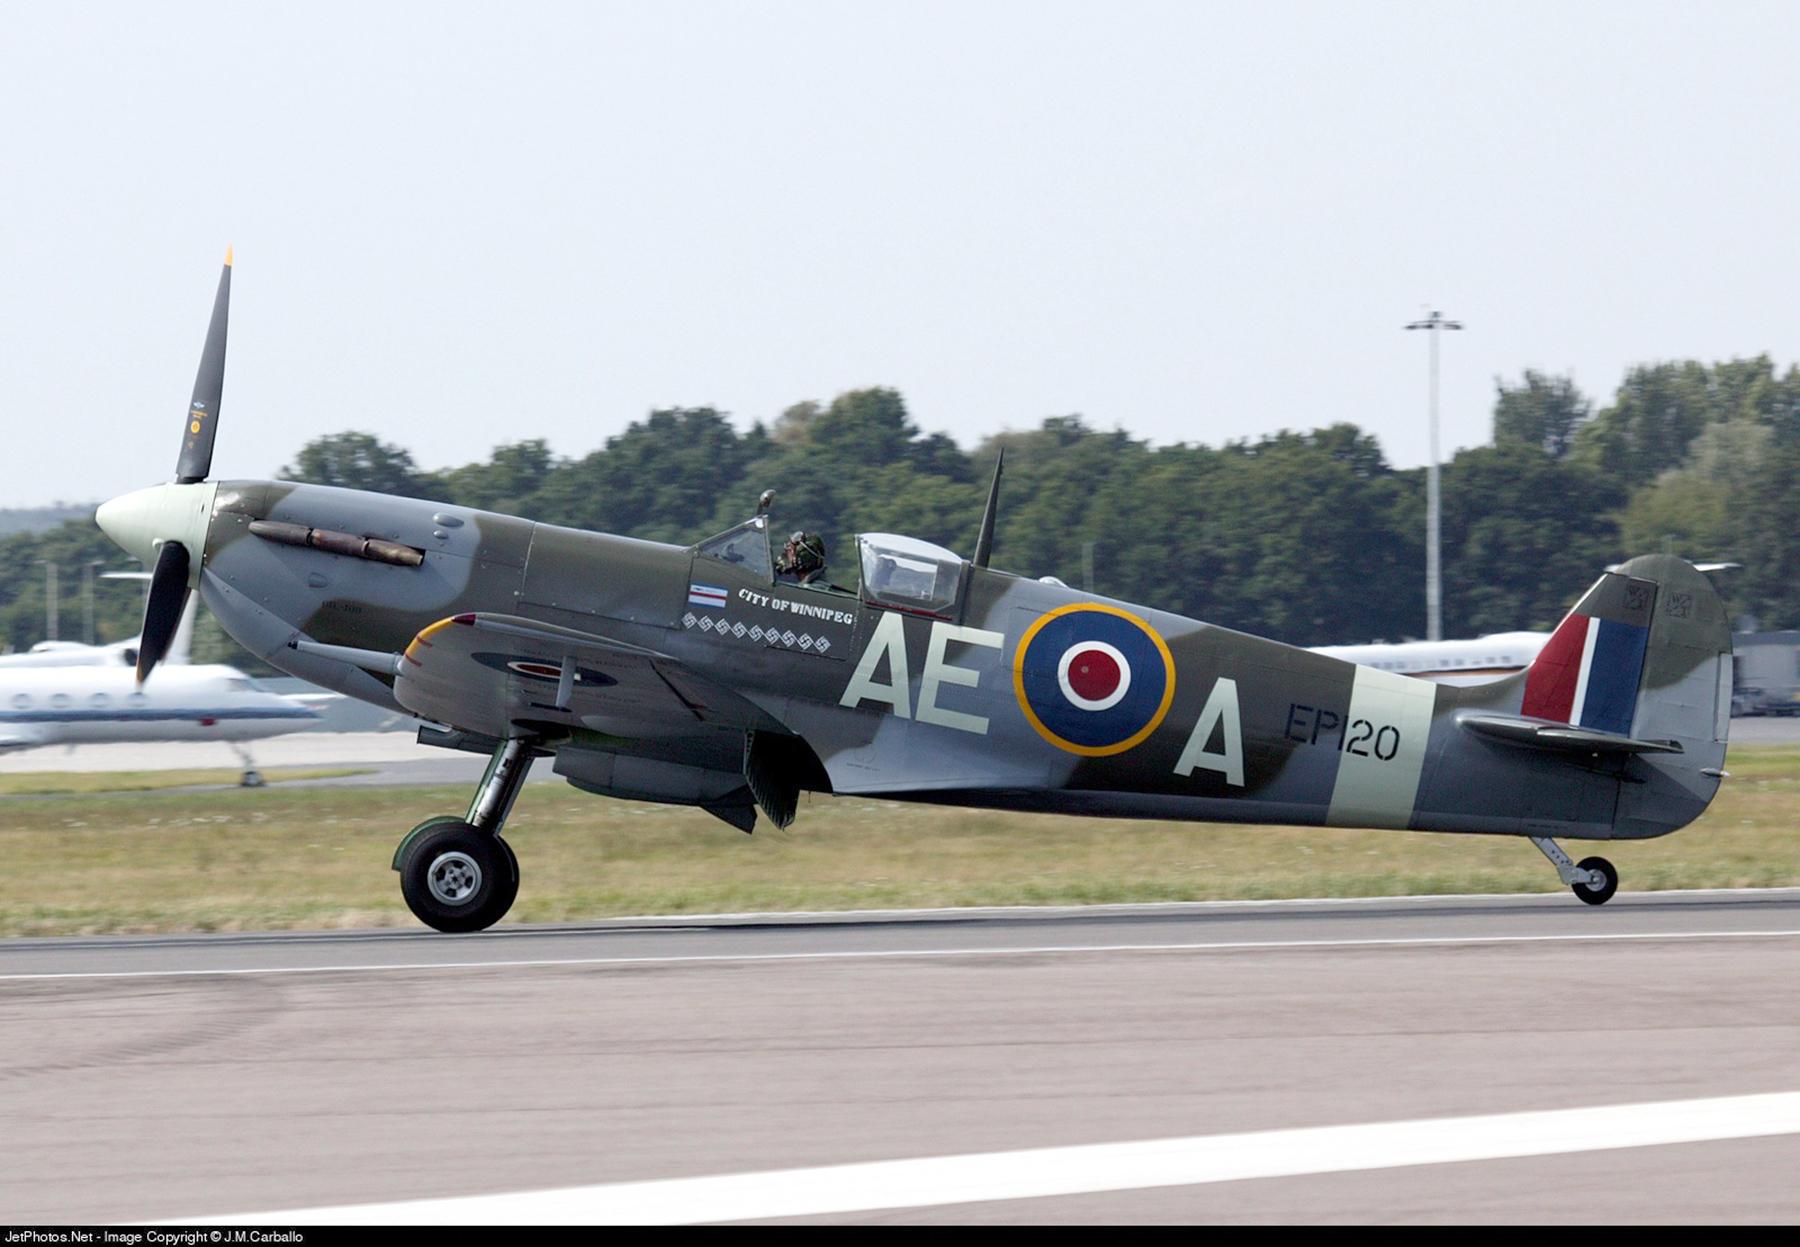 Airworthy Spitfire warbird LFVb RCAF 402Sqn AEA EP120 02